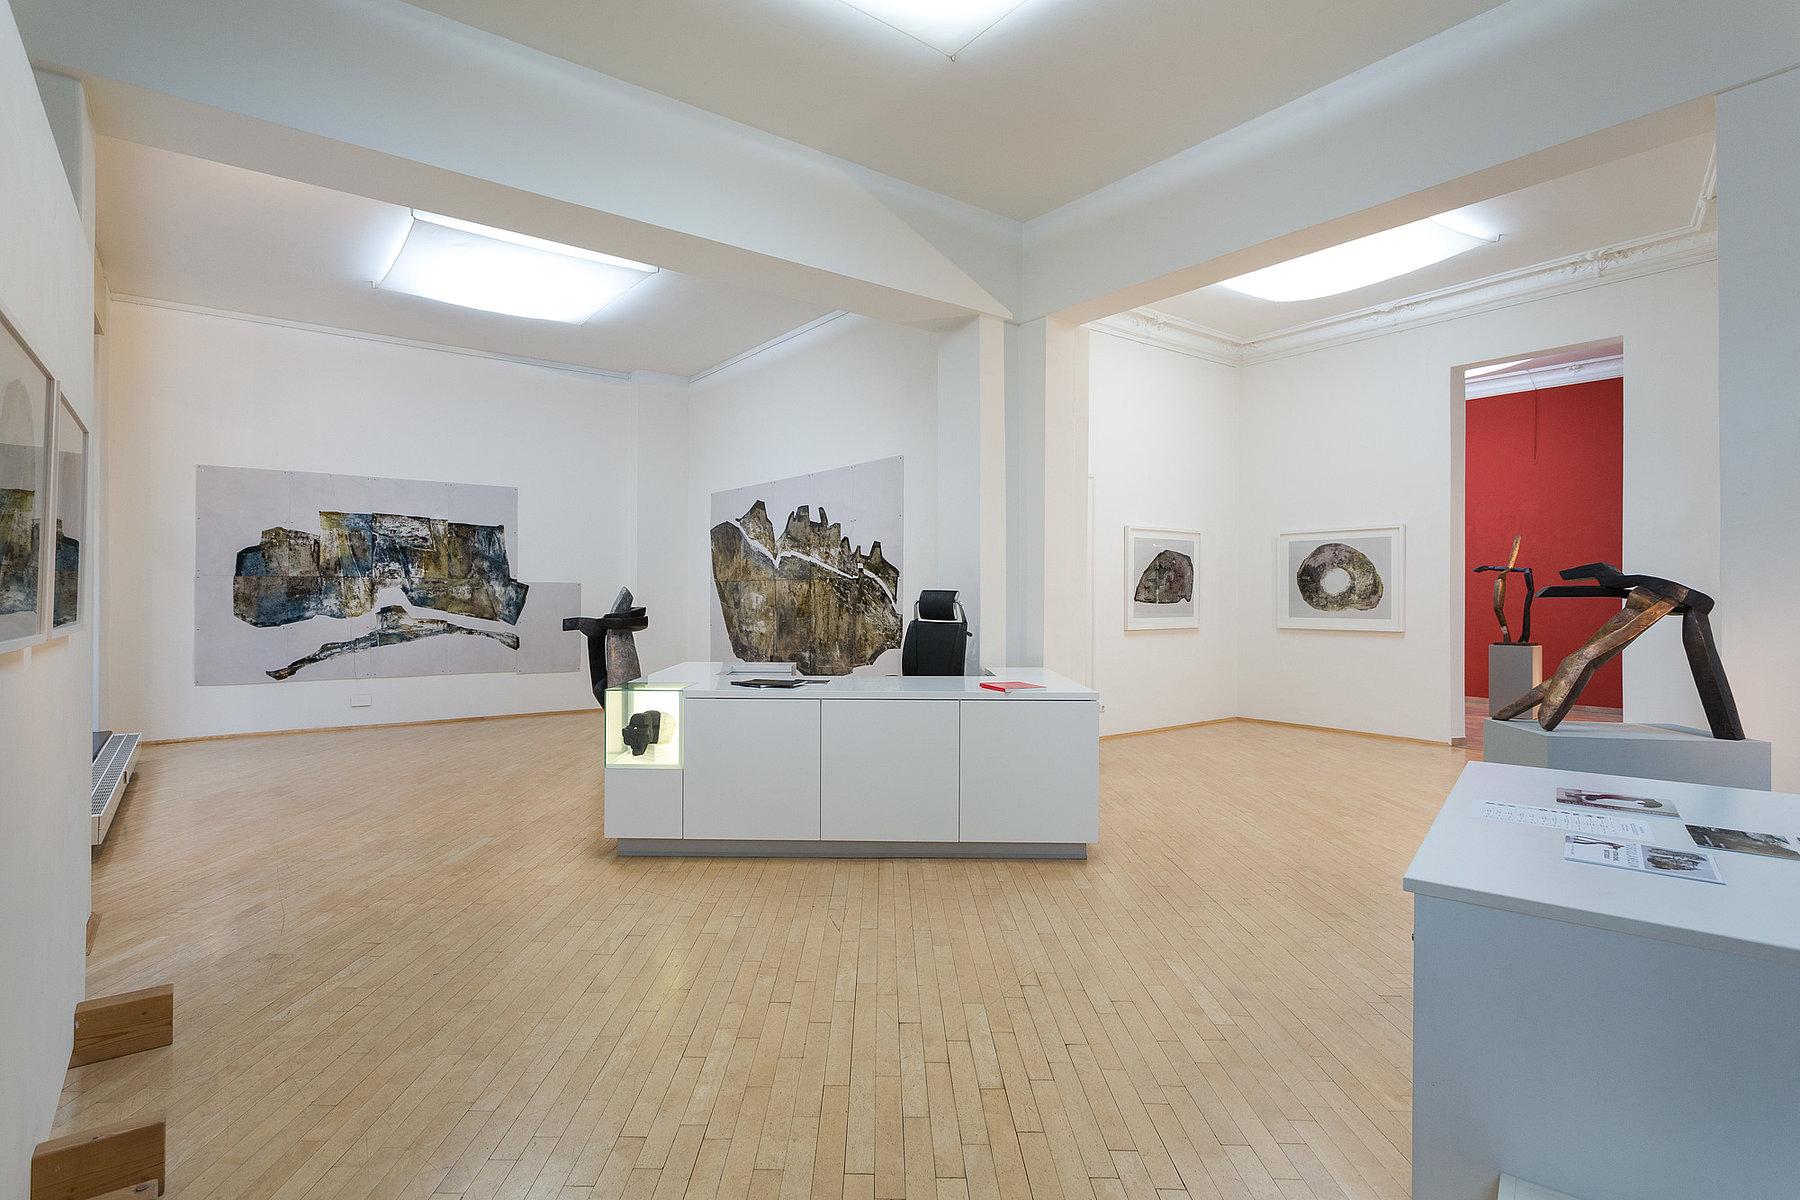 Galerie Photo Nue >> Art Gallery Sybille Nuett Dresden Contemporary Art Sculpture